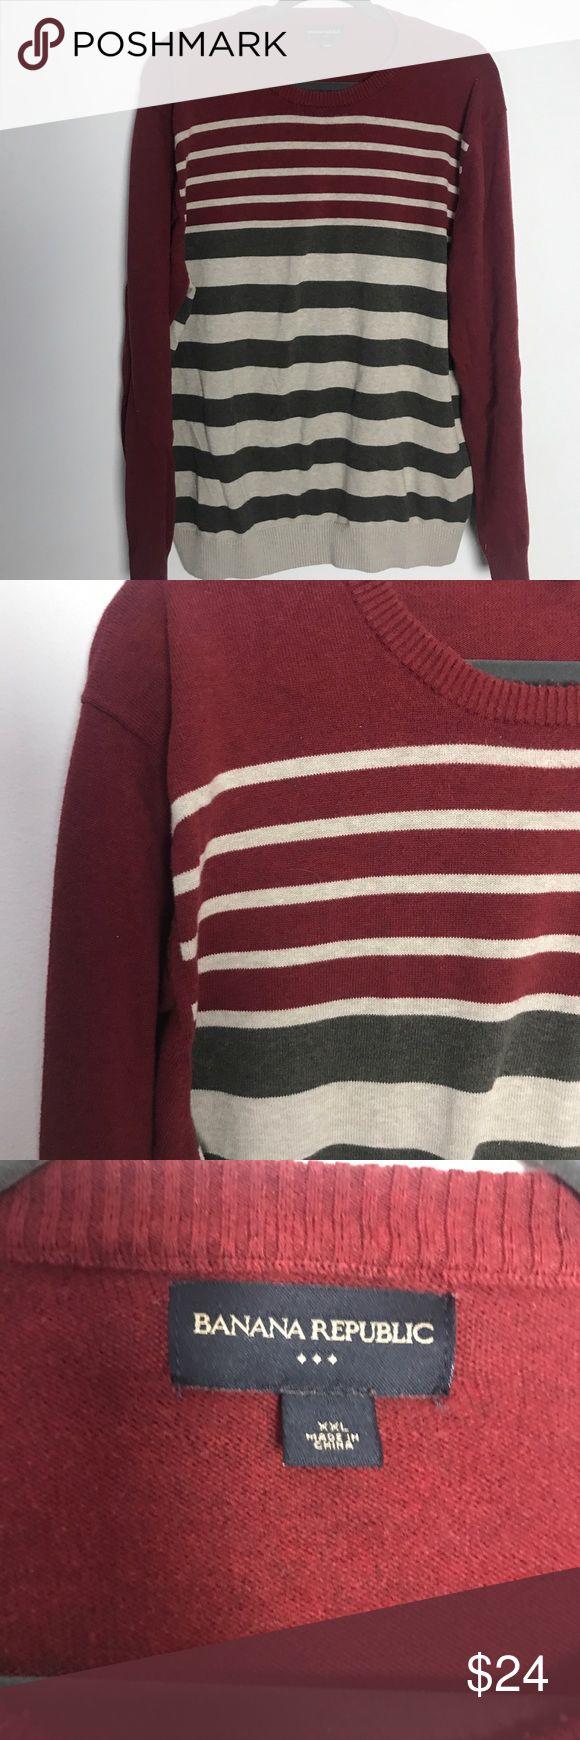 Banana Republic Factory xxl sweater EUC 100 cotton Smoke